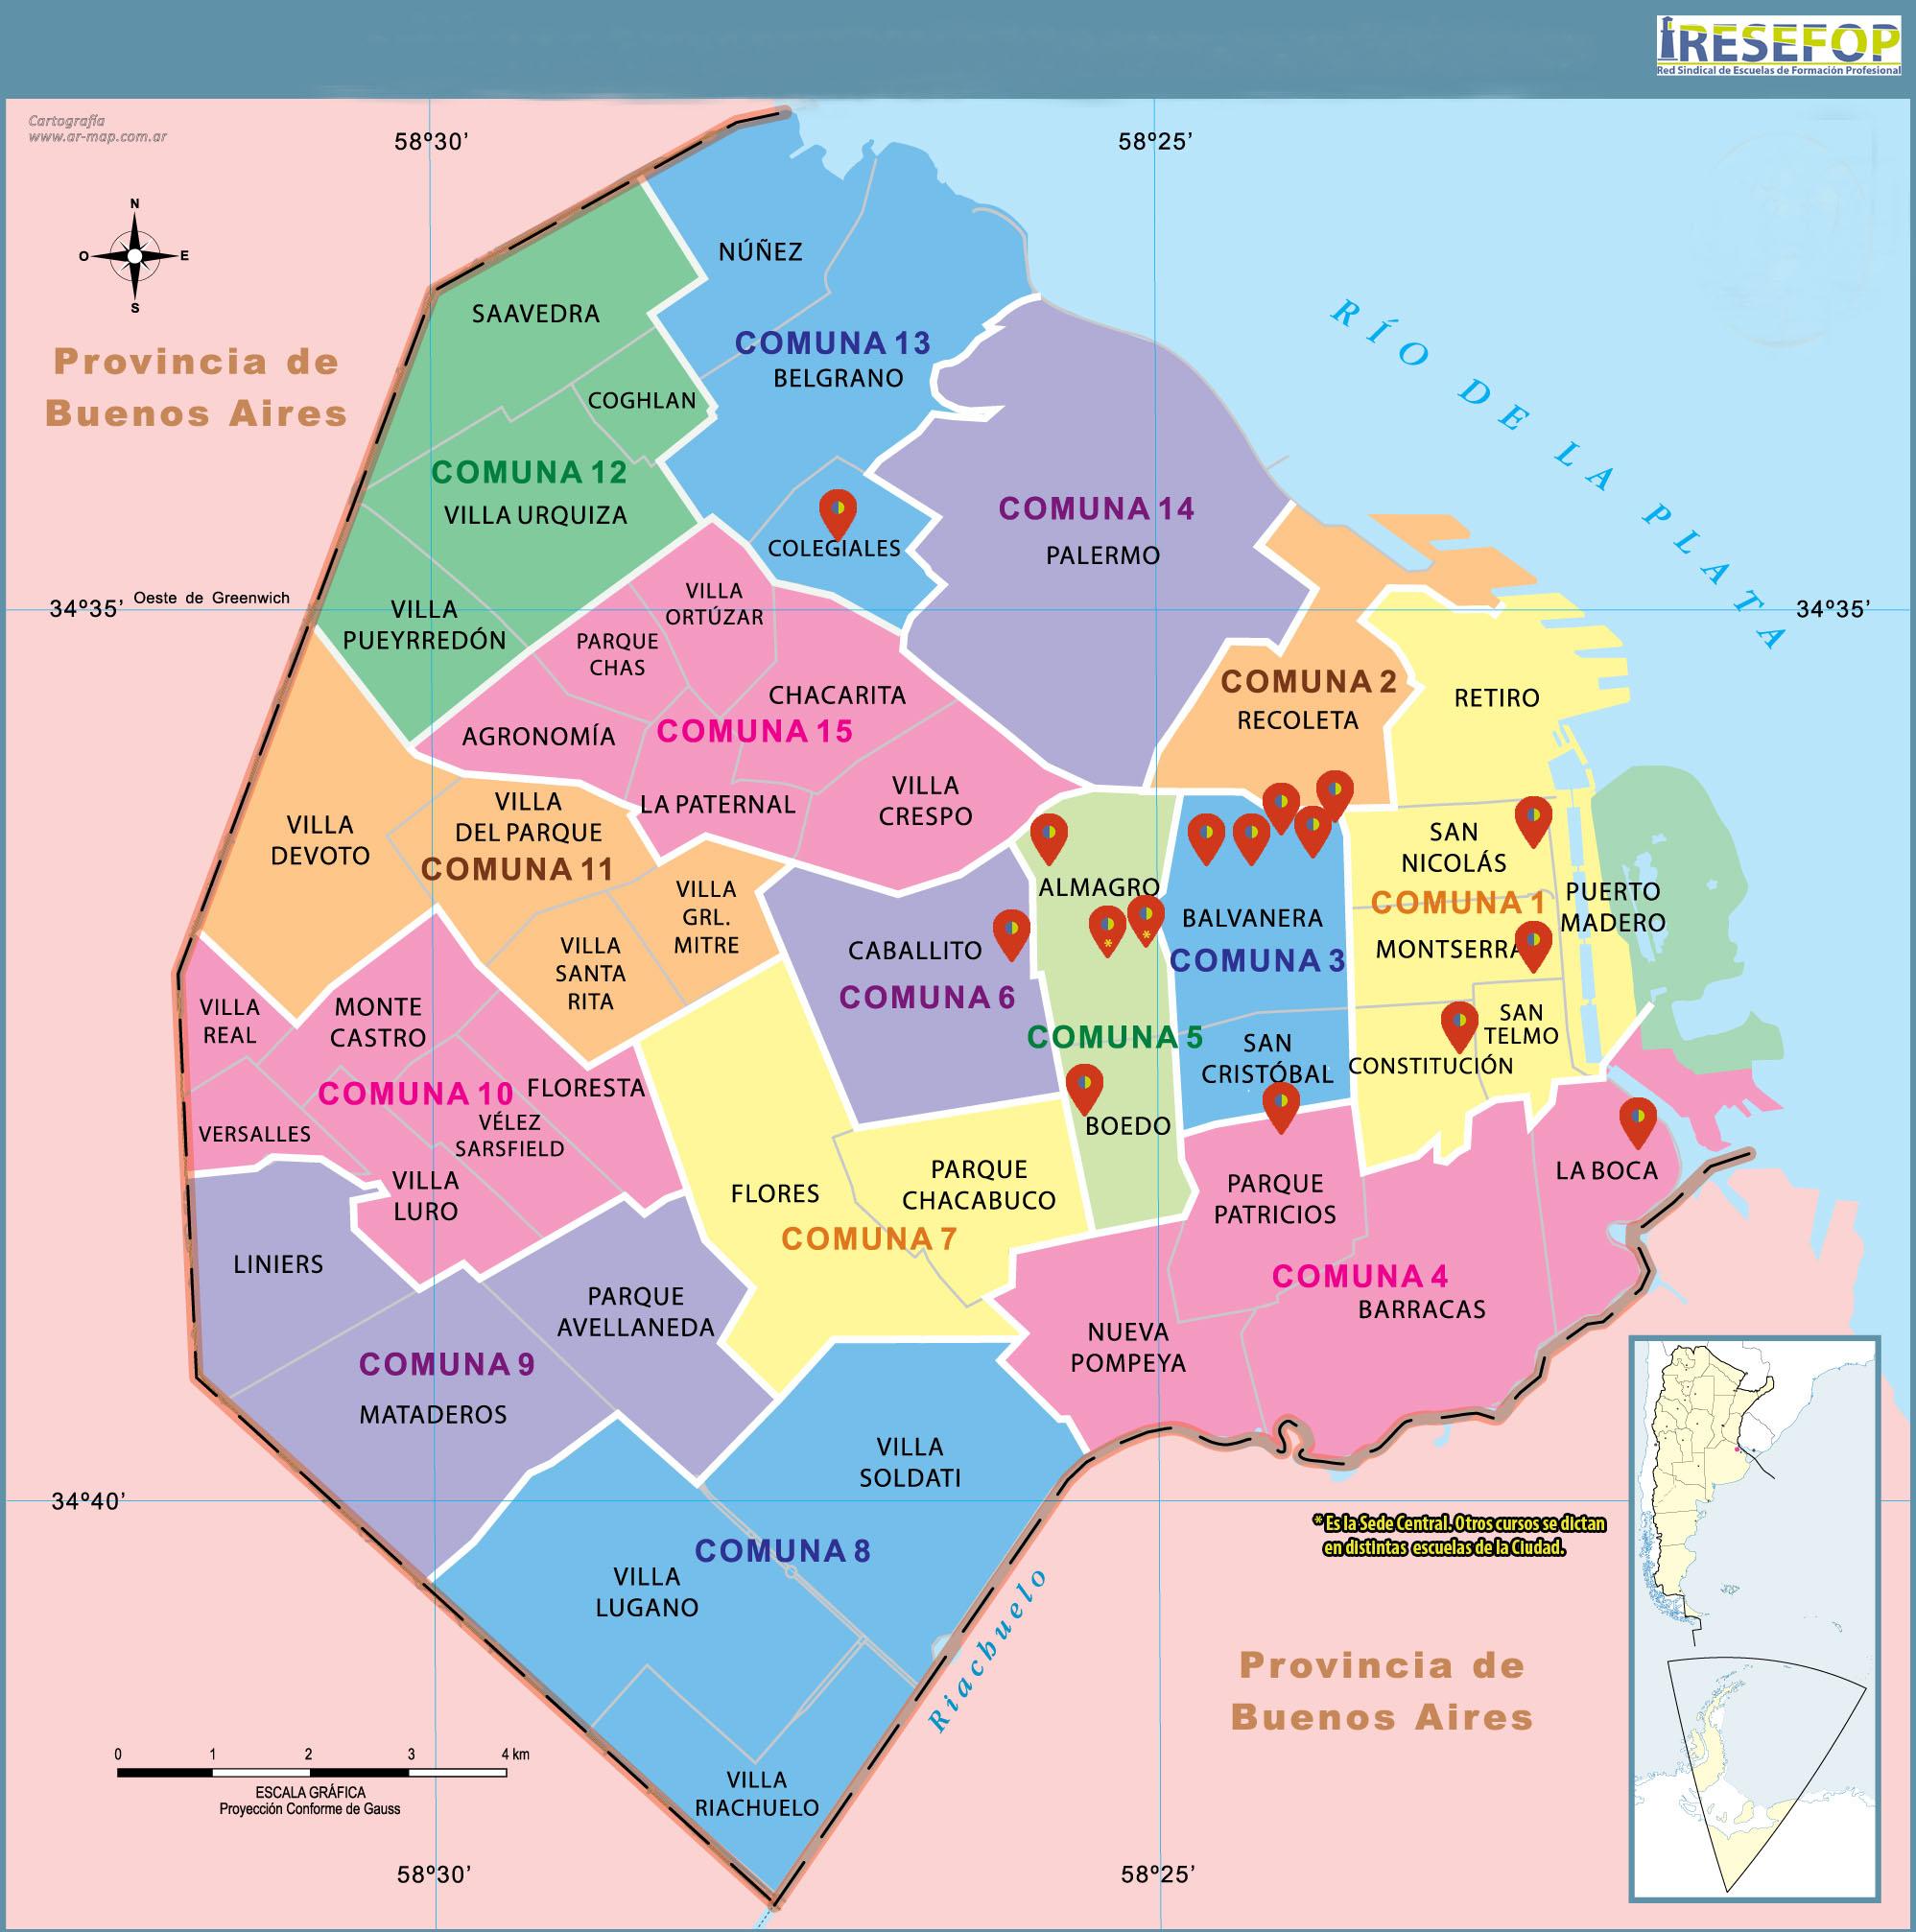 Mapa cfp resefop caba